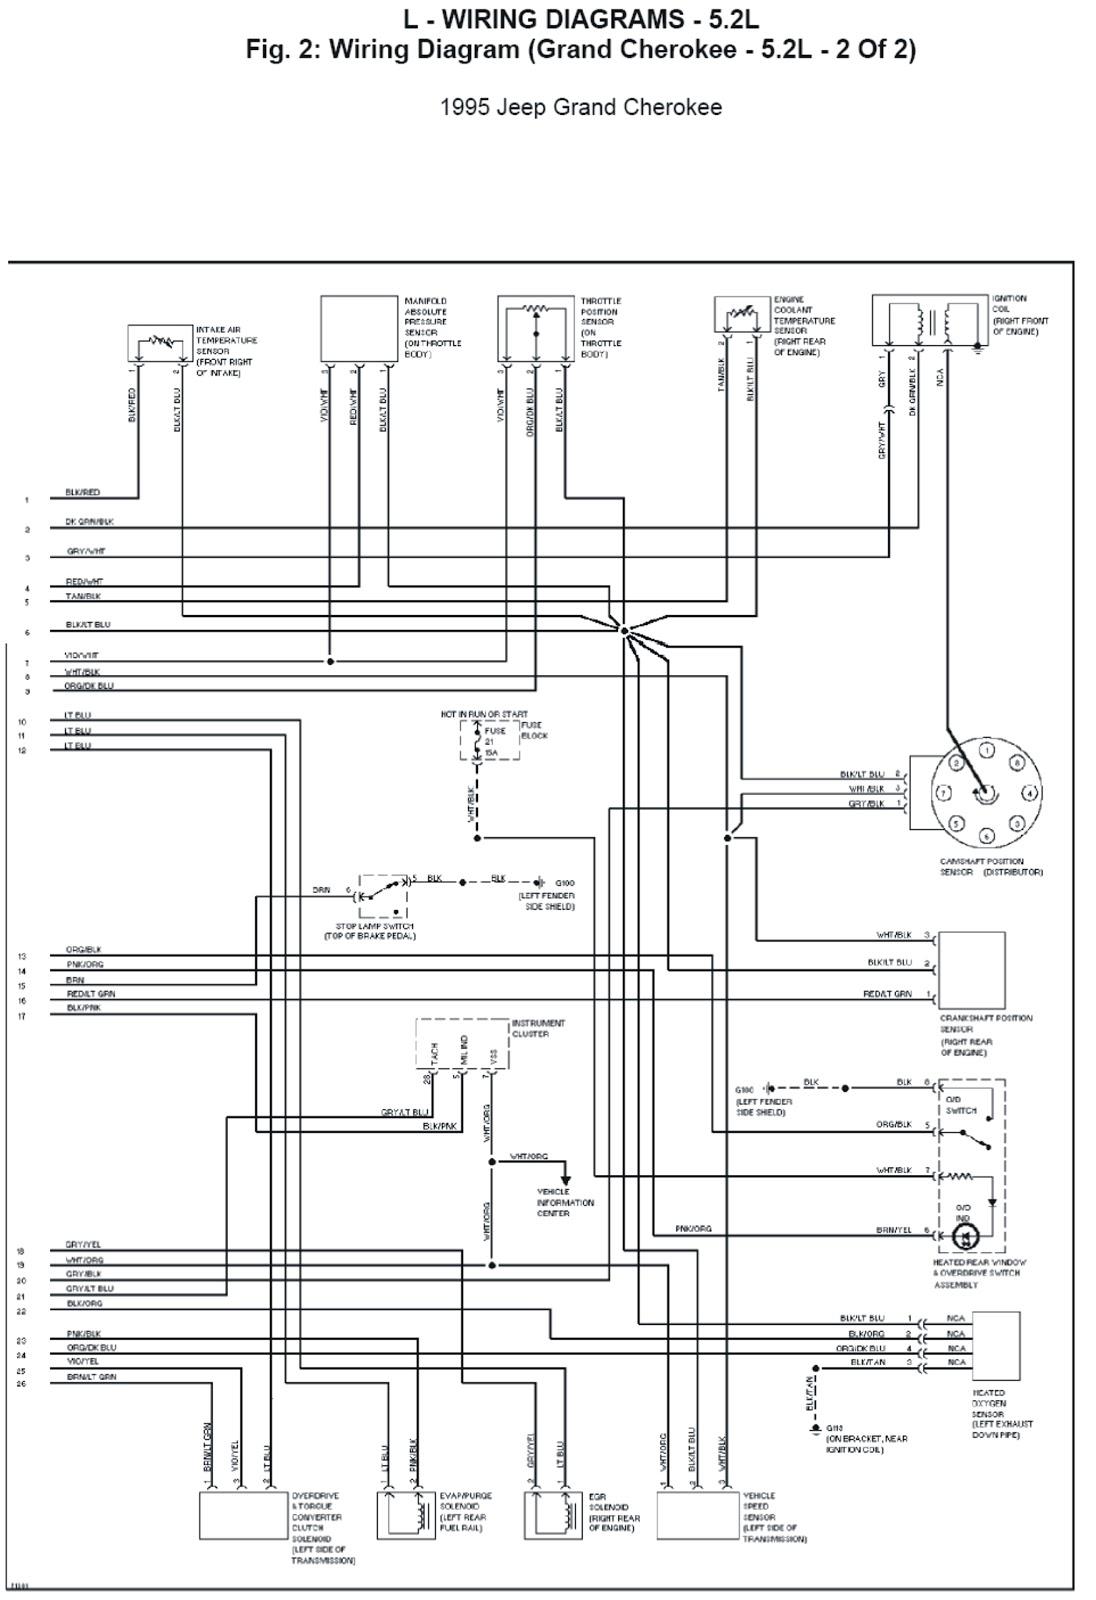 1995 Jeep Grand Cherokee Trailer Wiring Diagram